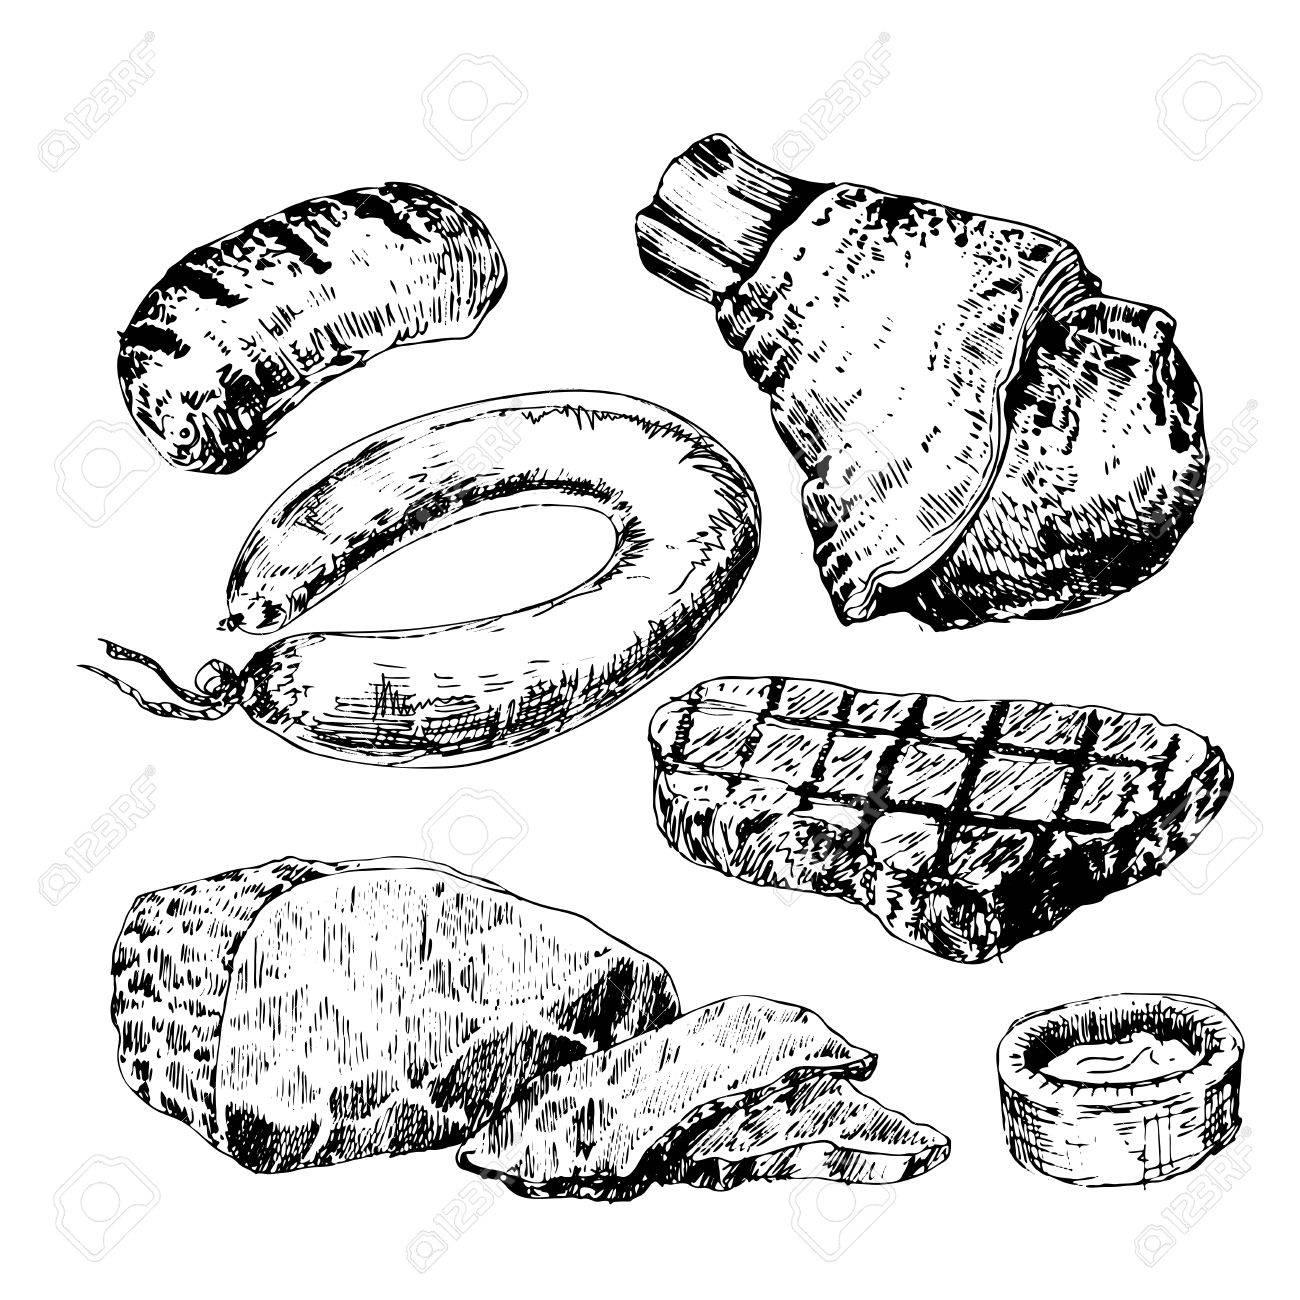 1300x1300 Various Meats Doodles Sausages, Wurst, Wiener, Salami, Steak